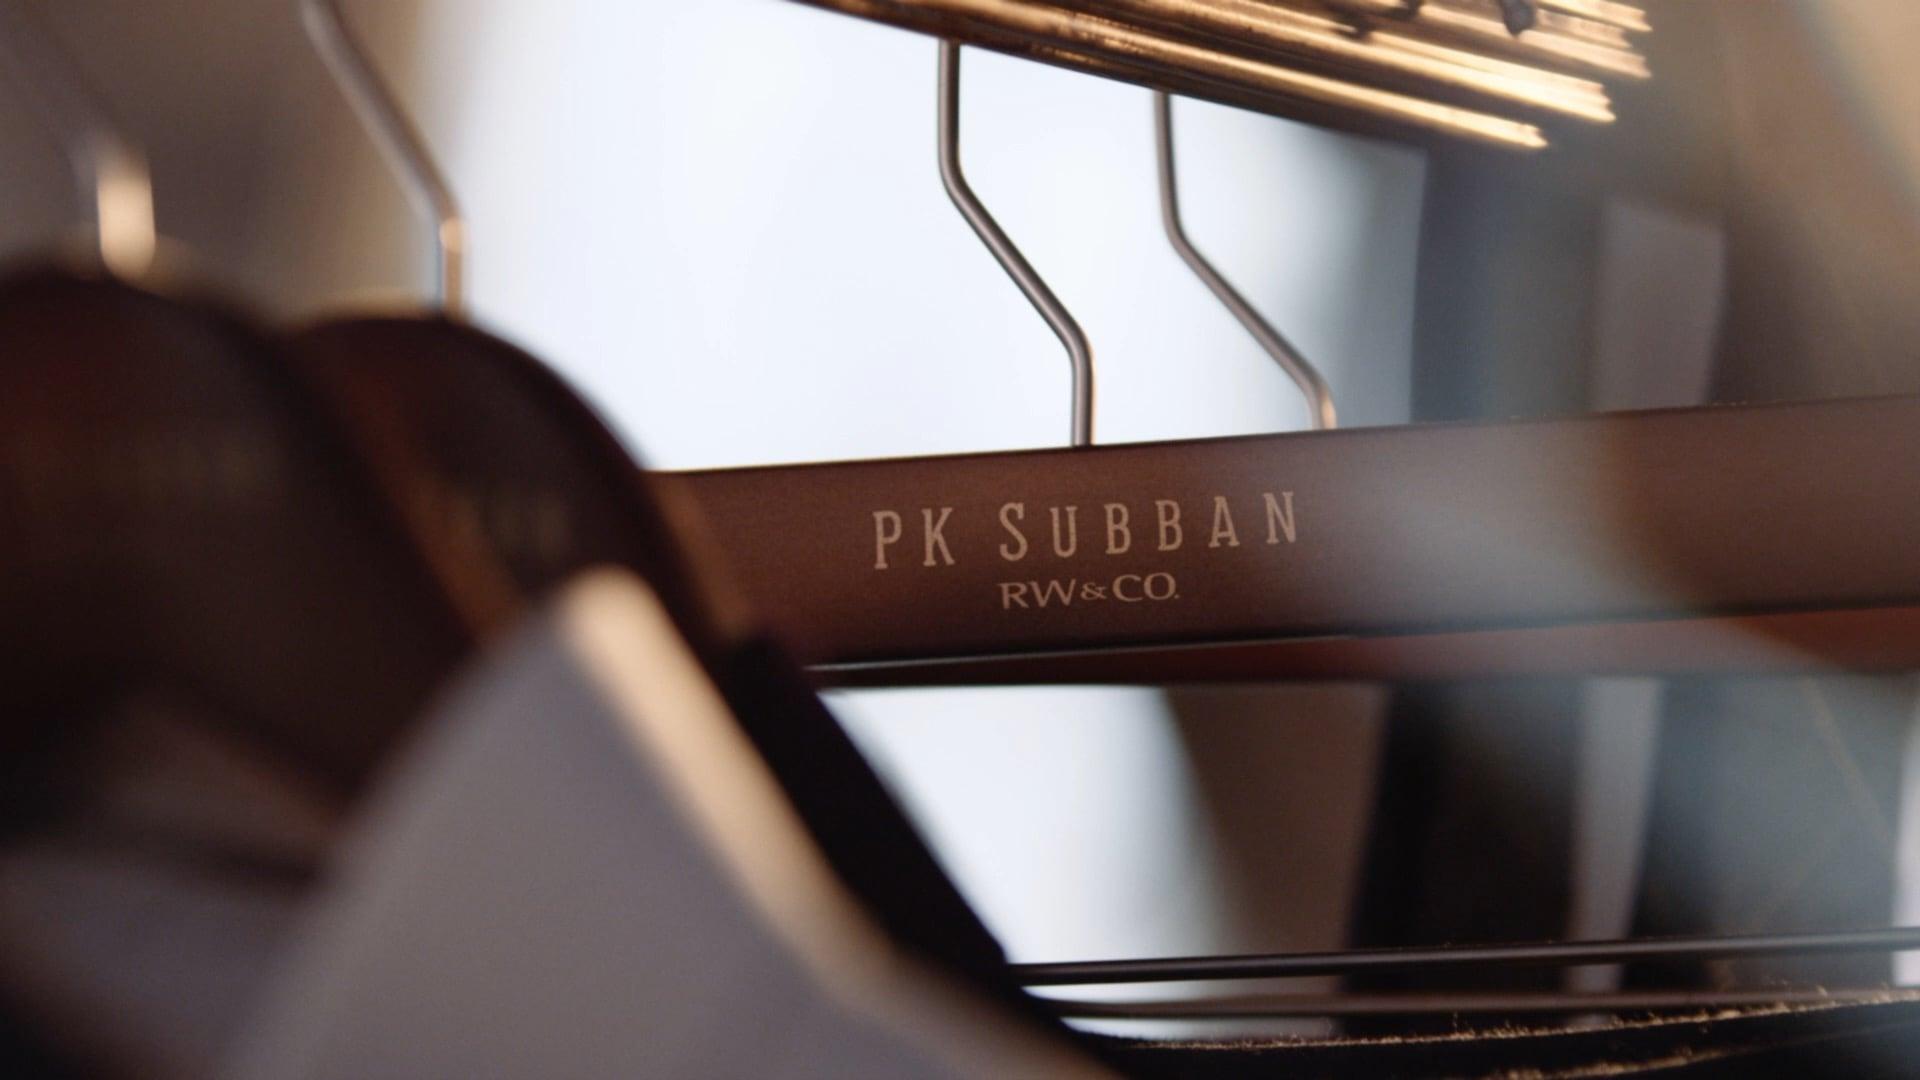 P.K. Subban